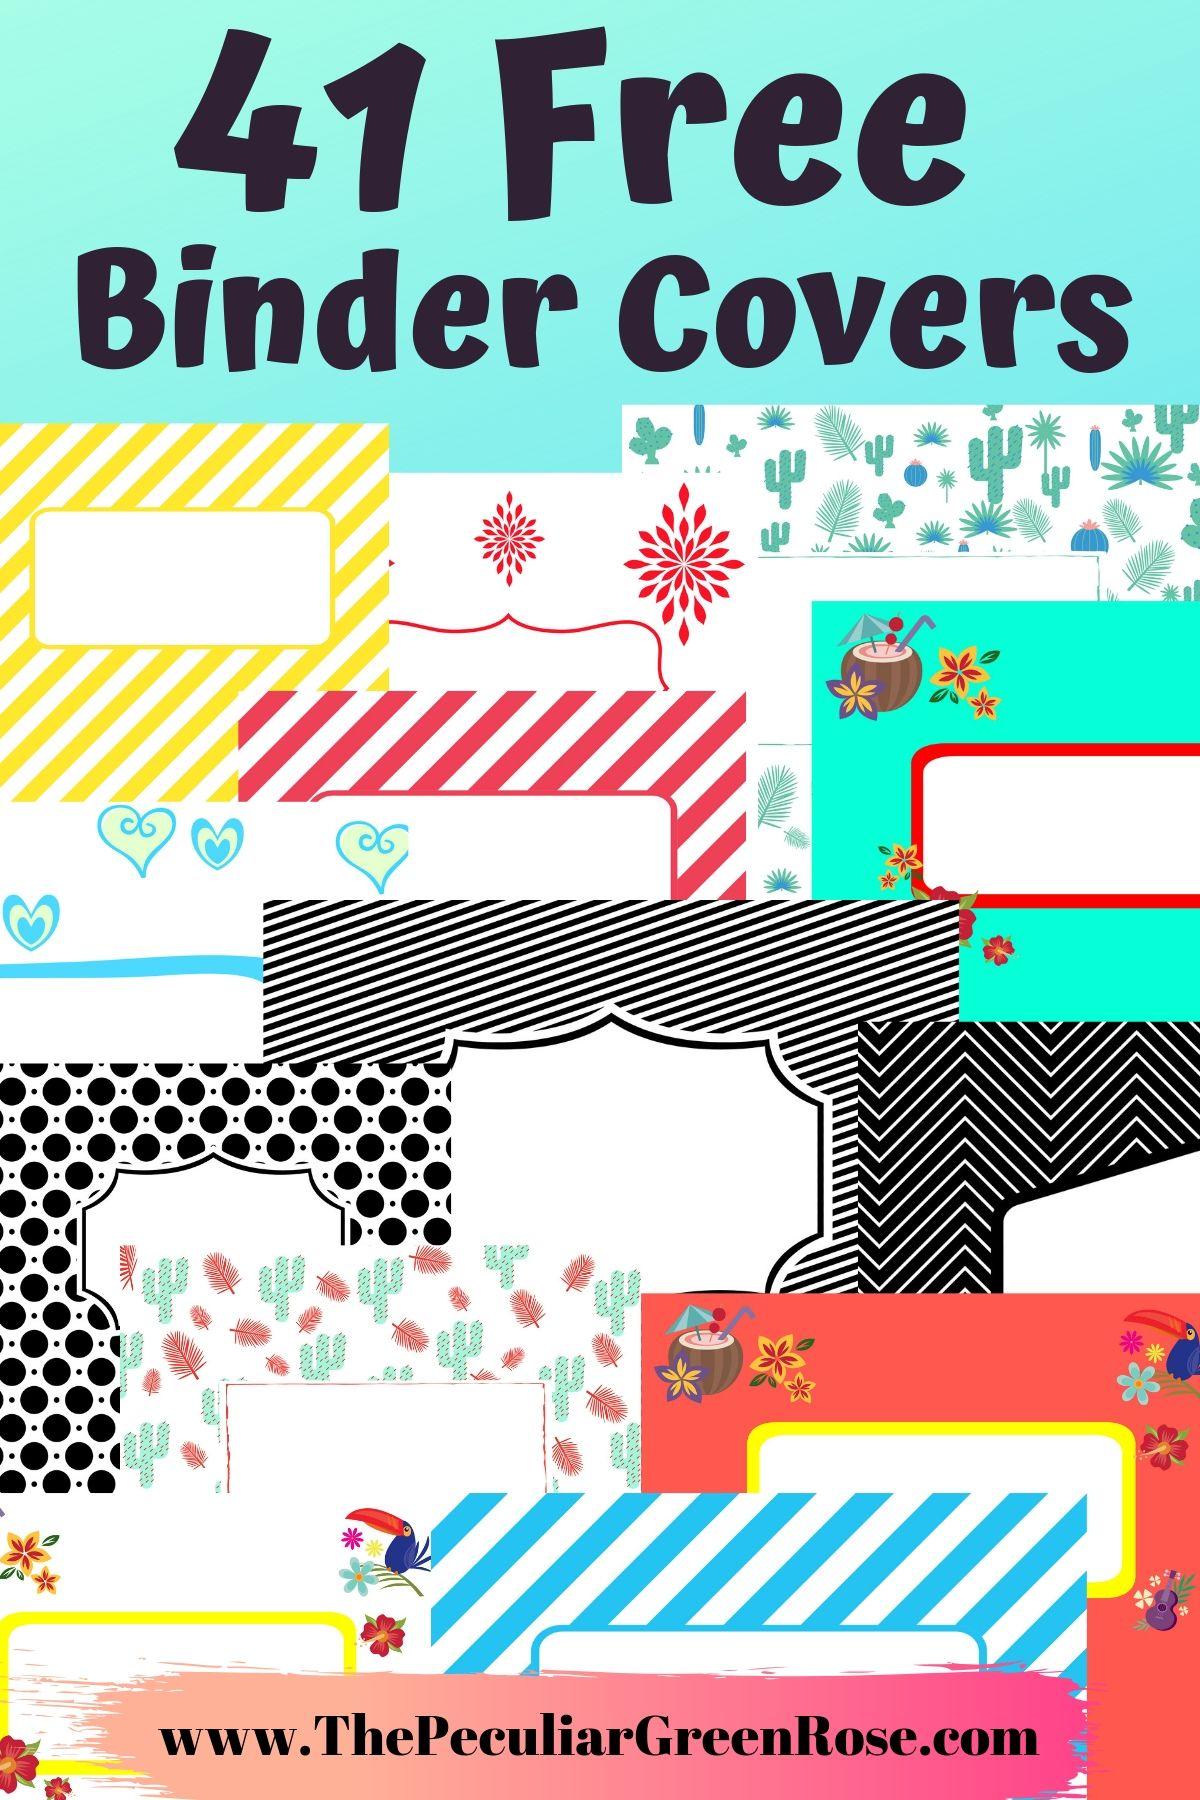 41 Free Printable Binder Covers The Peculiar Green Rose